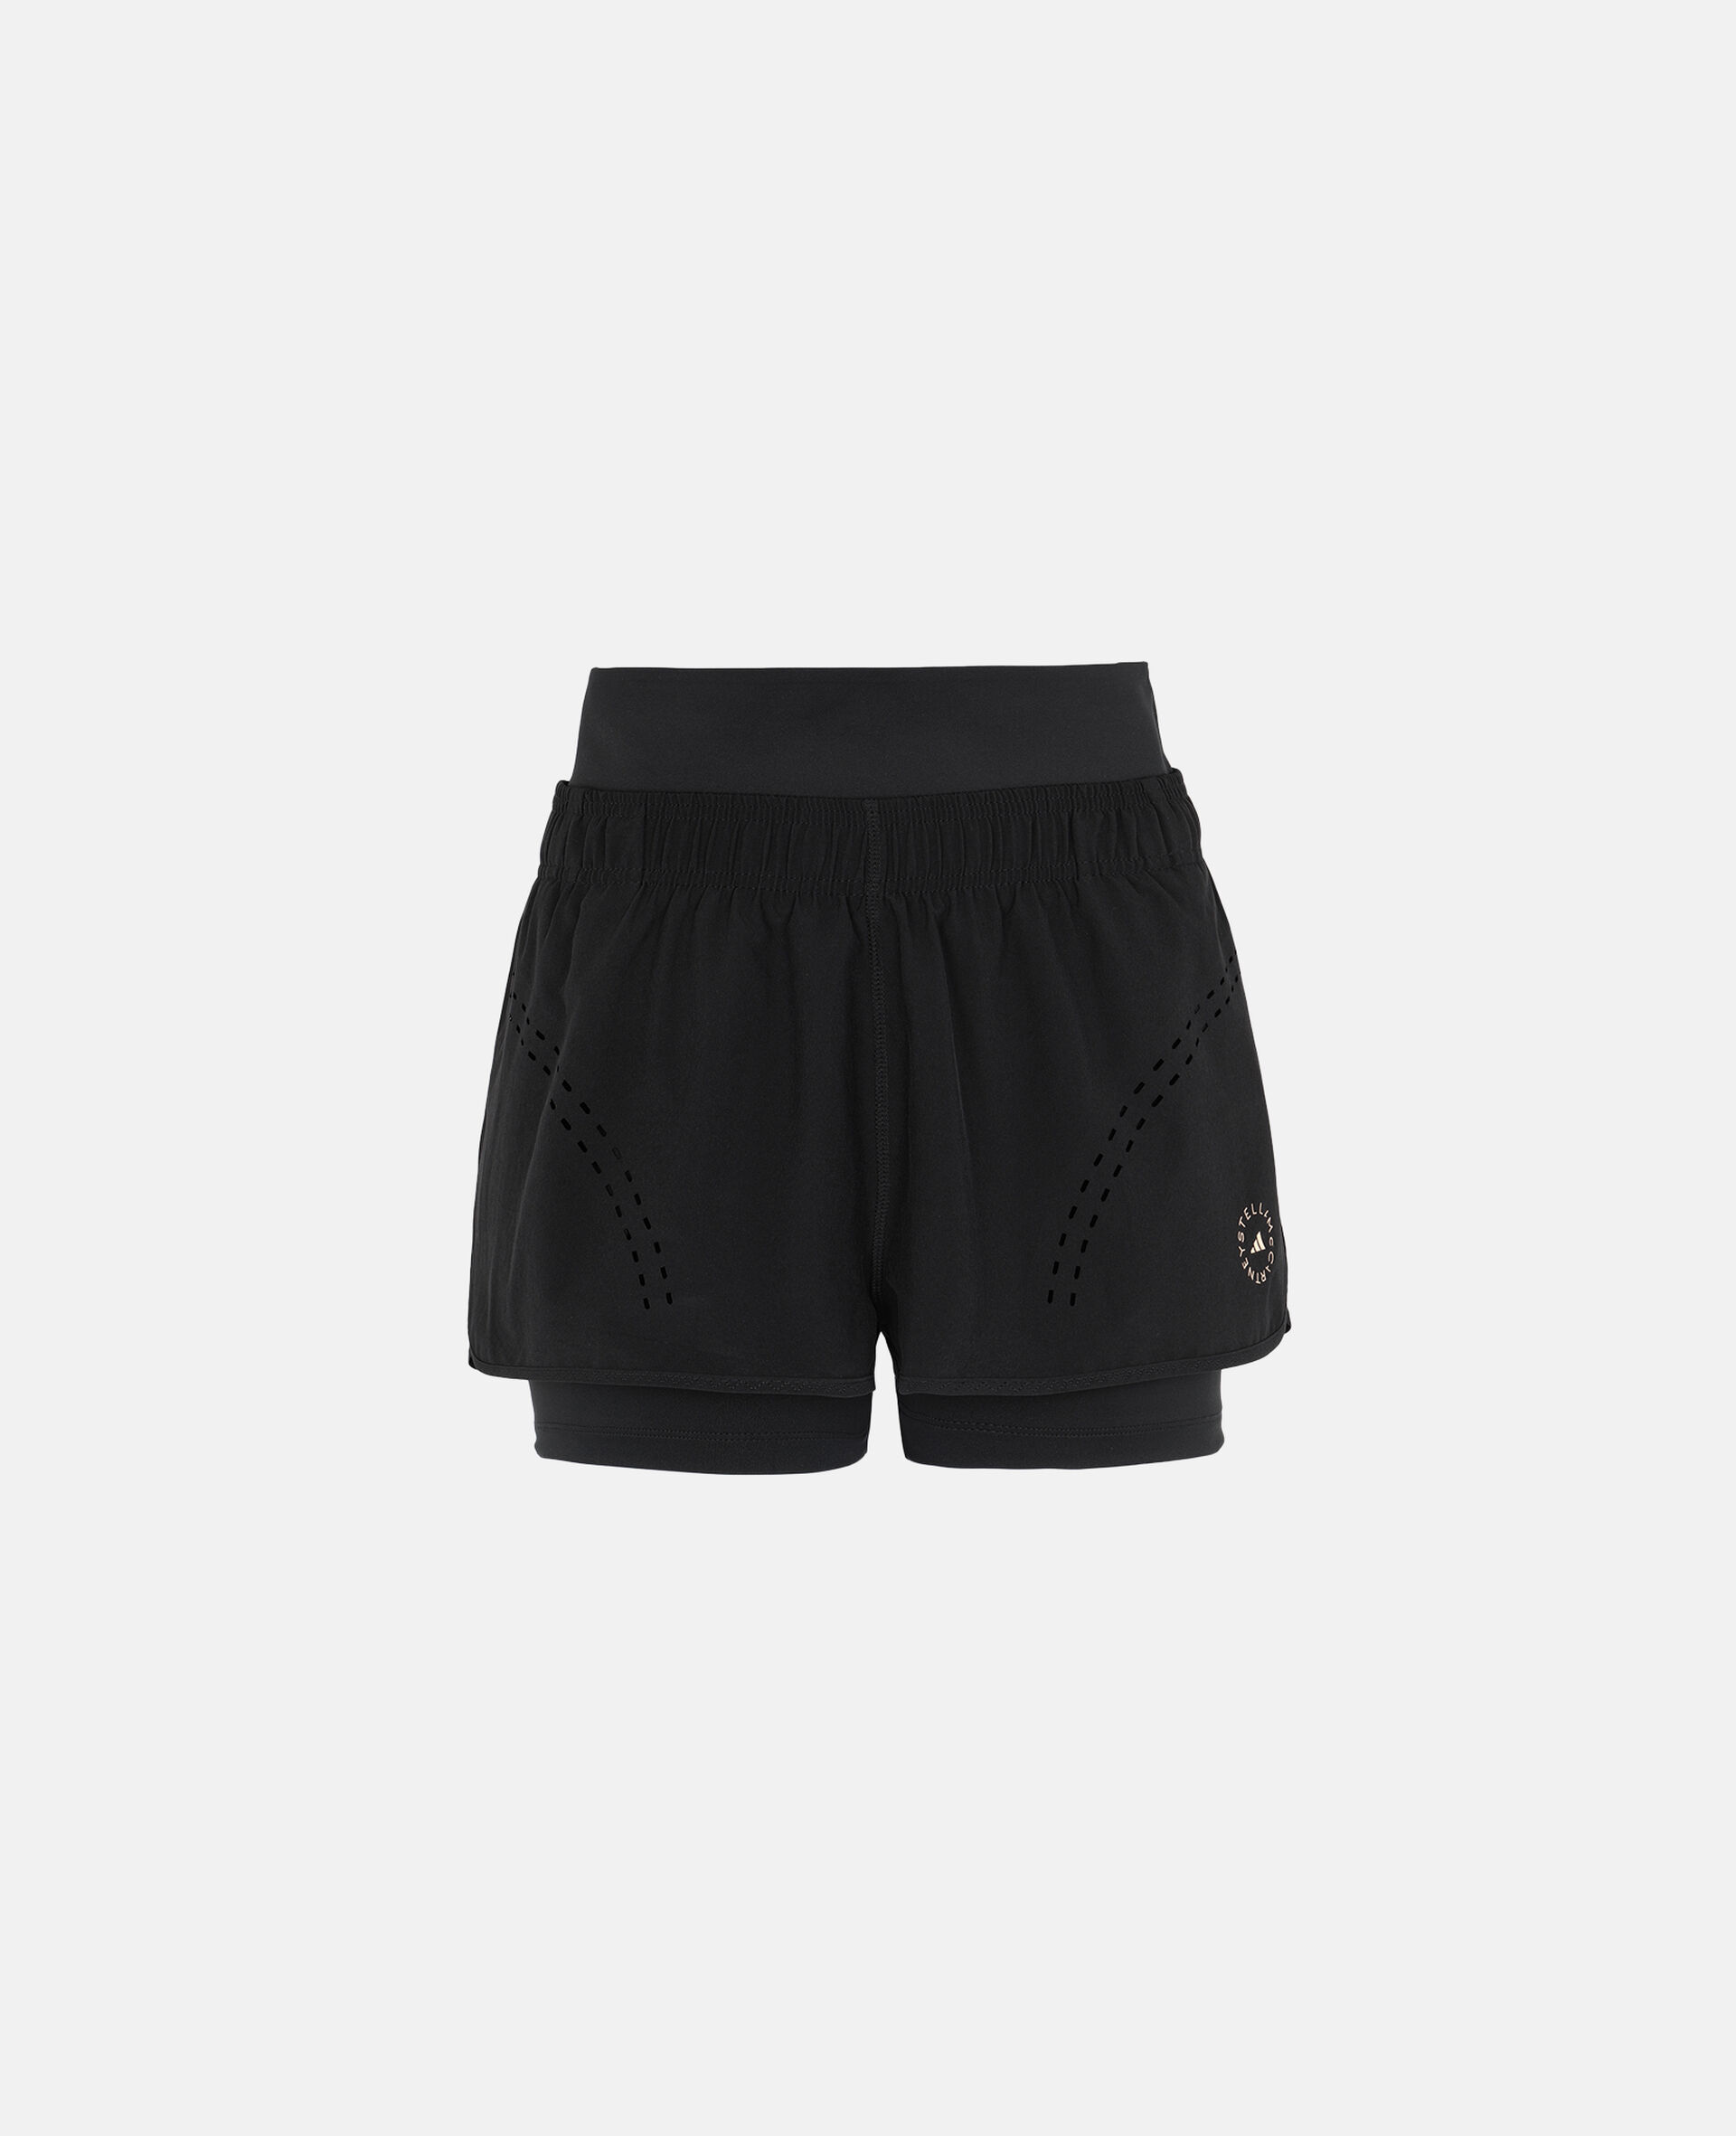 Shorts Training TruePurpose Neri-Nero-large image number 4